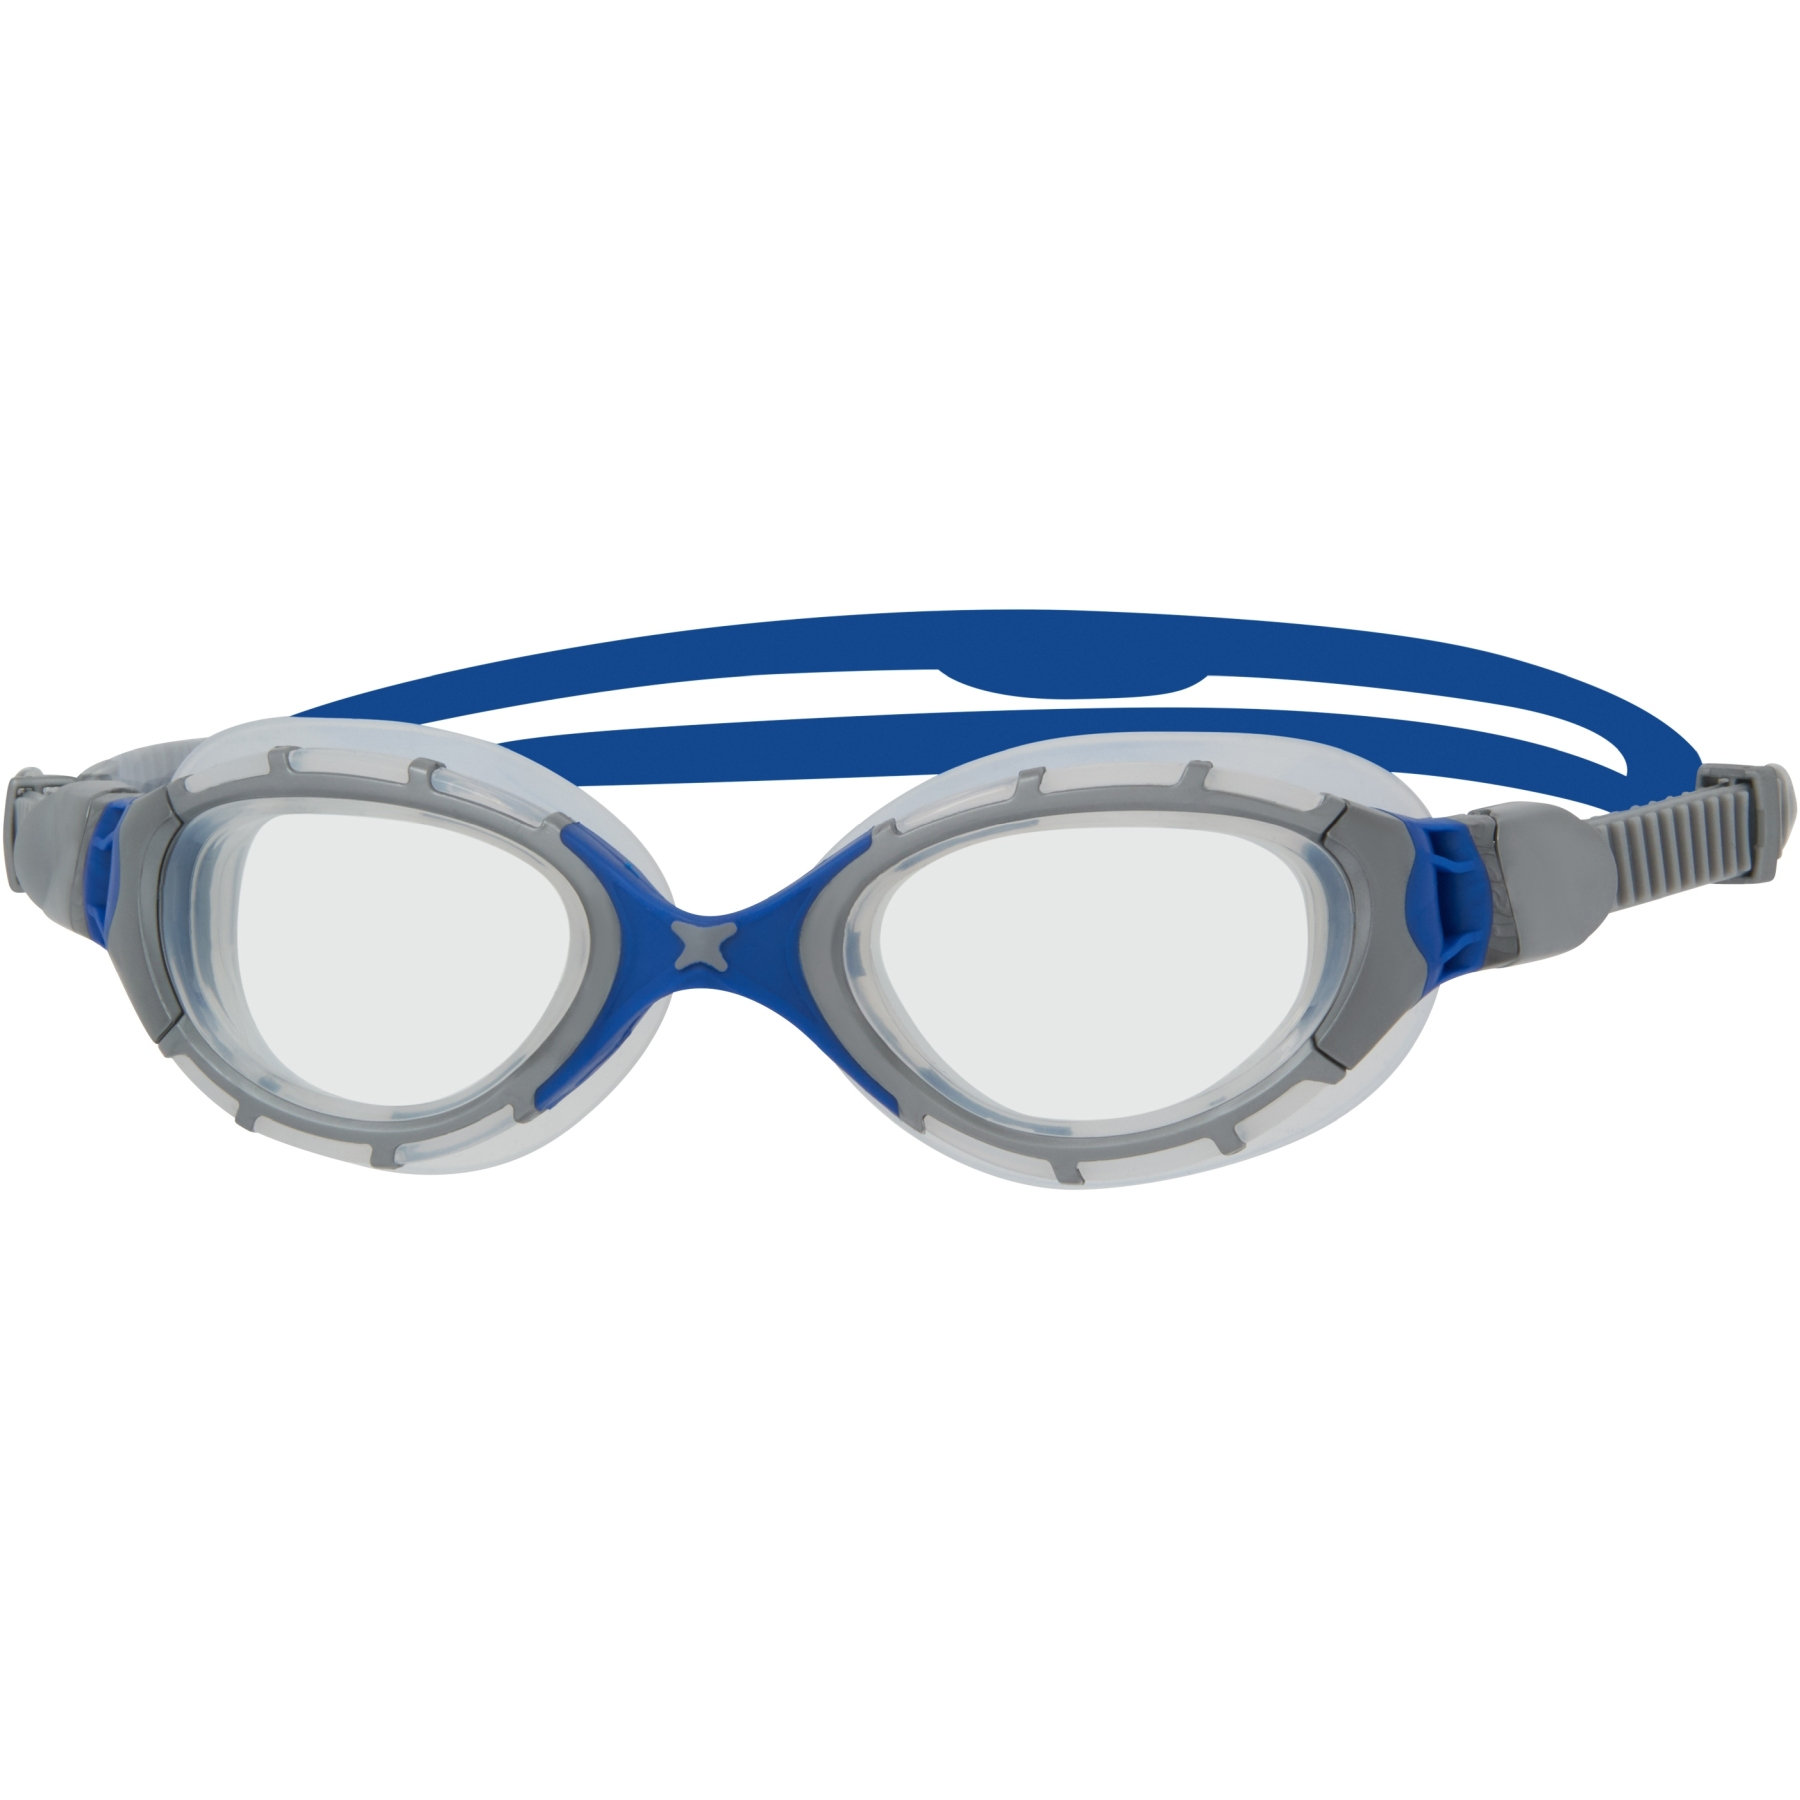 Zoggs Predator Flex Gafas de natación - gris/azul/claro